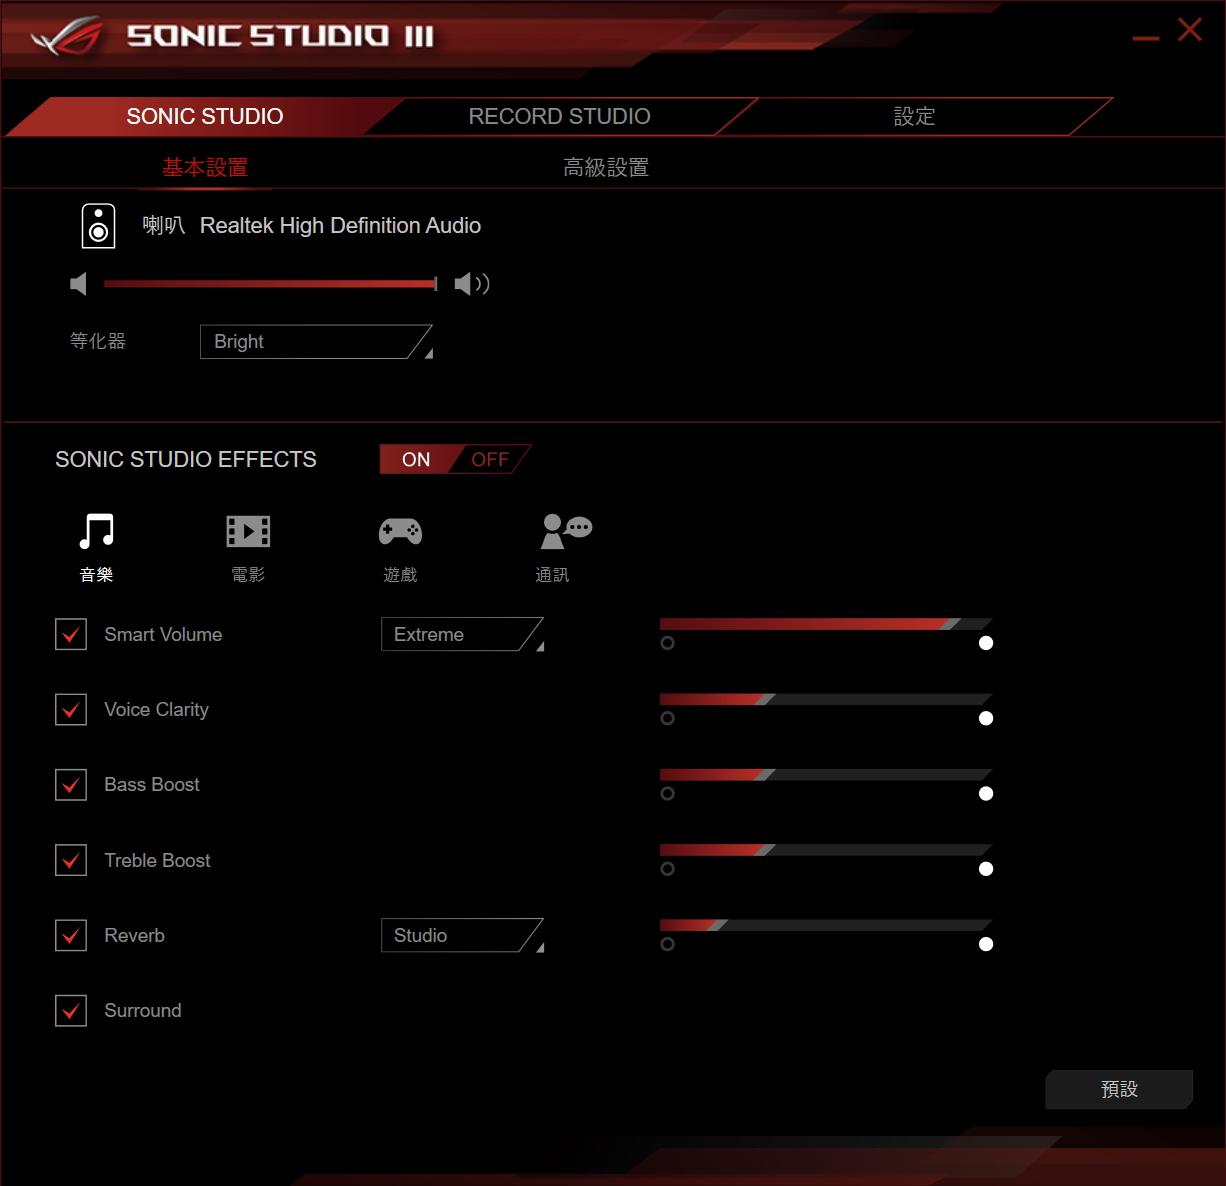 SRS Audio Essentials 與 Sonic Studio 3 音效軟體比較 - Mobile01